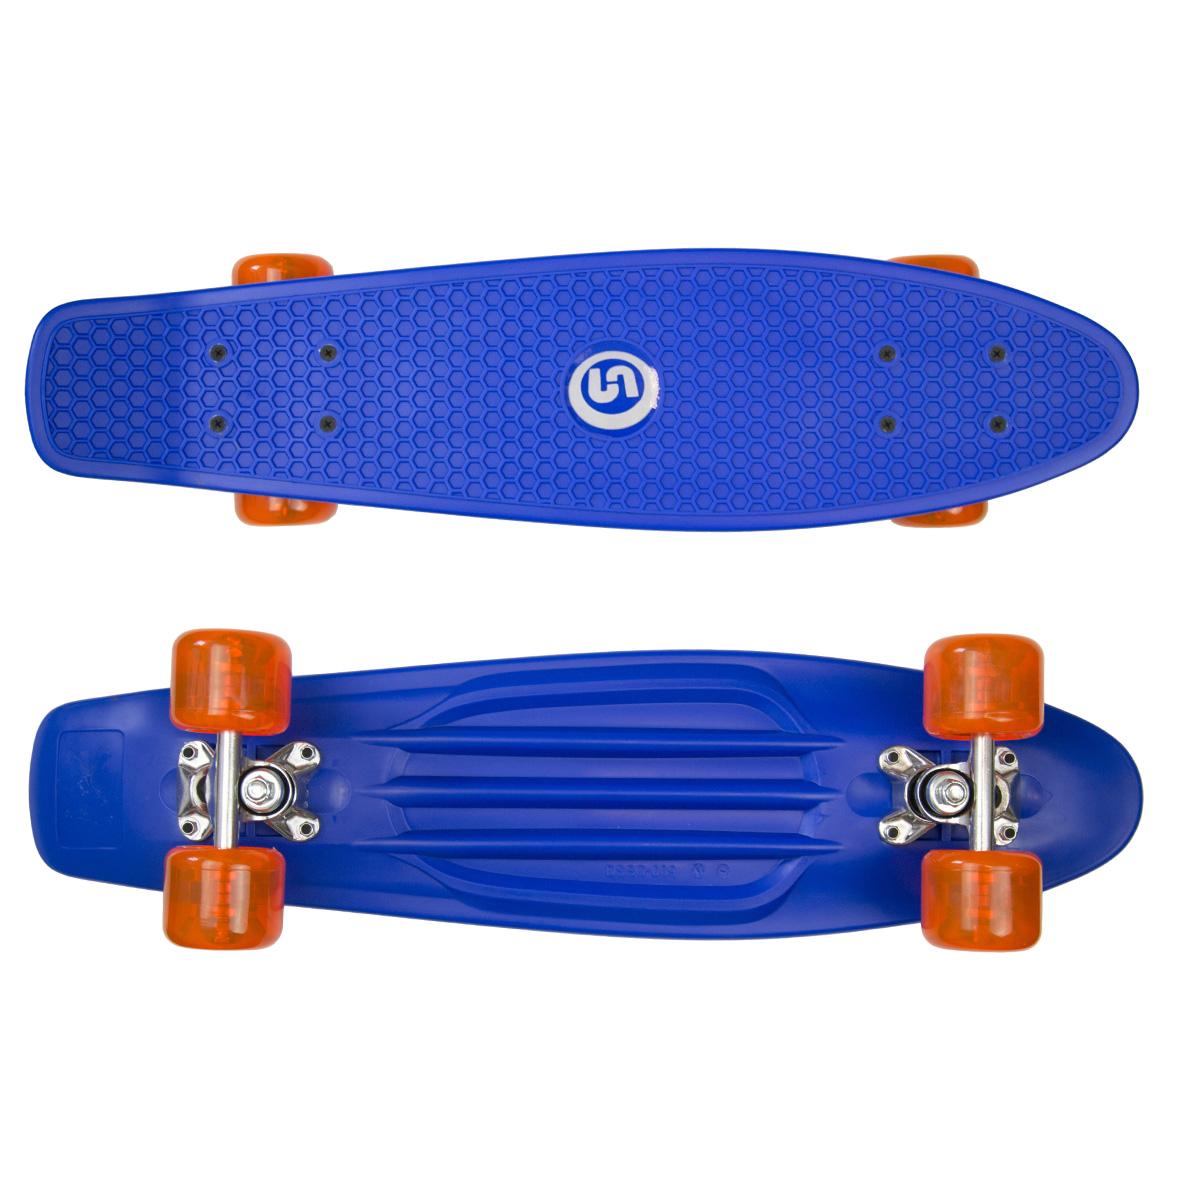 "Plastic Board SPARTAN 24,5"" - modrý"